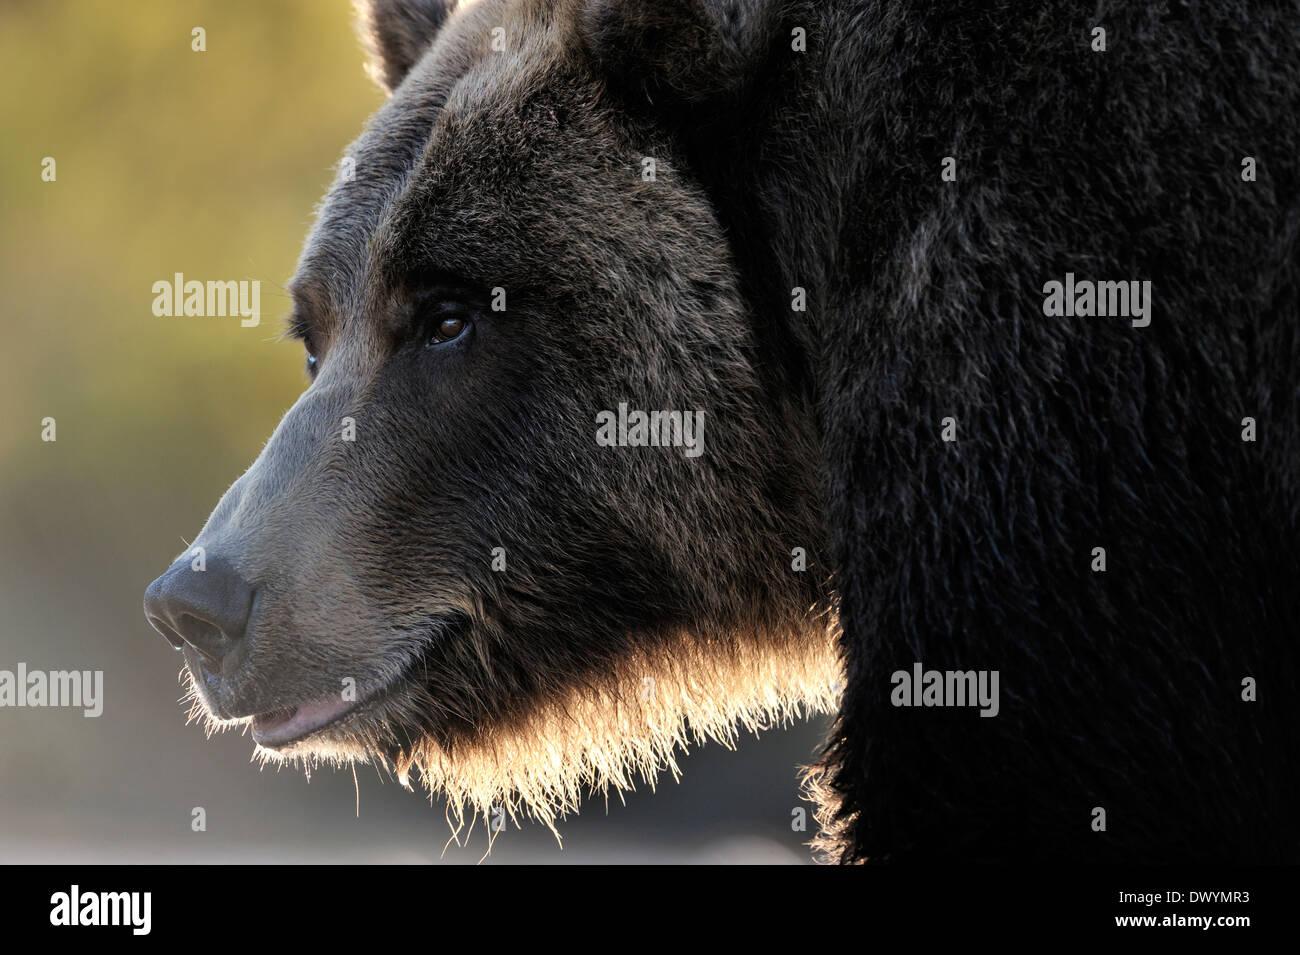 Oso grizzly (Ursus arctos horribilis) retrato con luz de fondo. Foto de stock